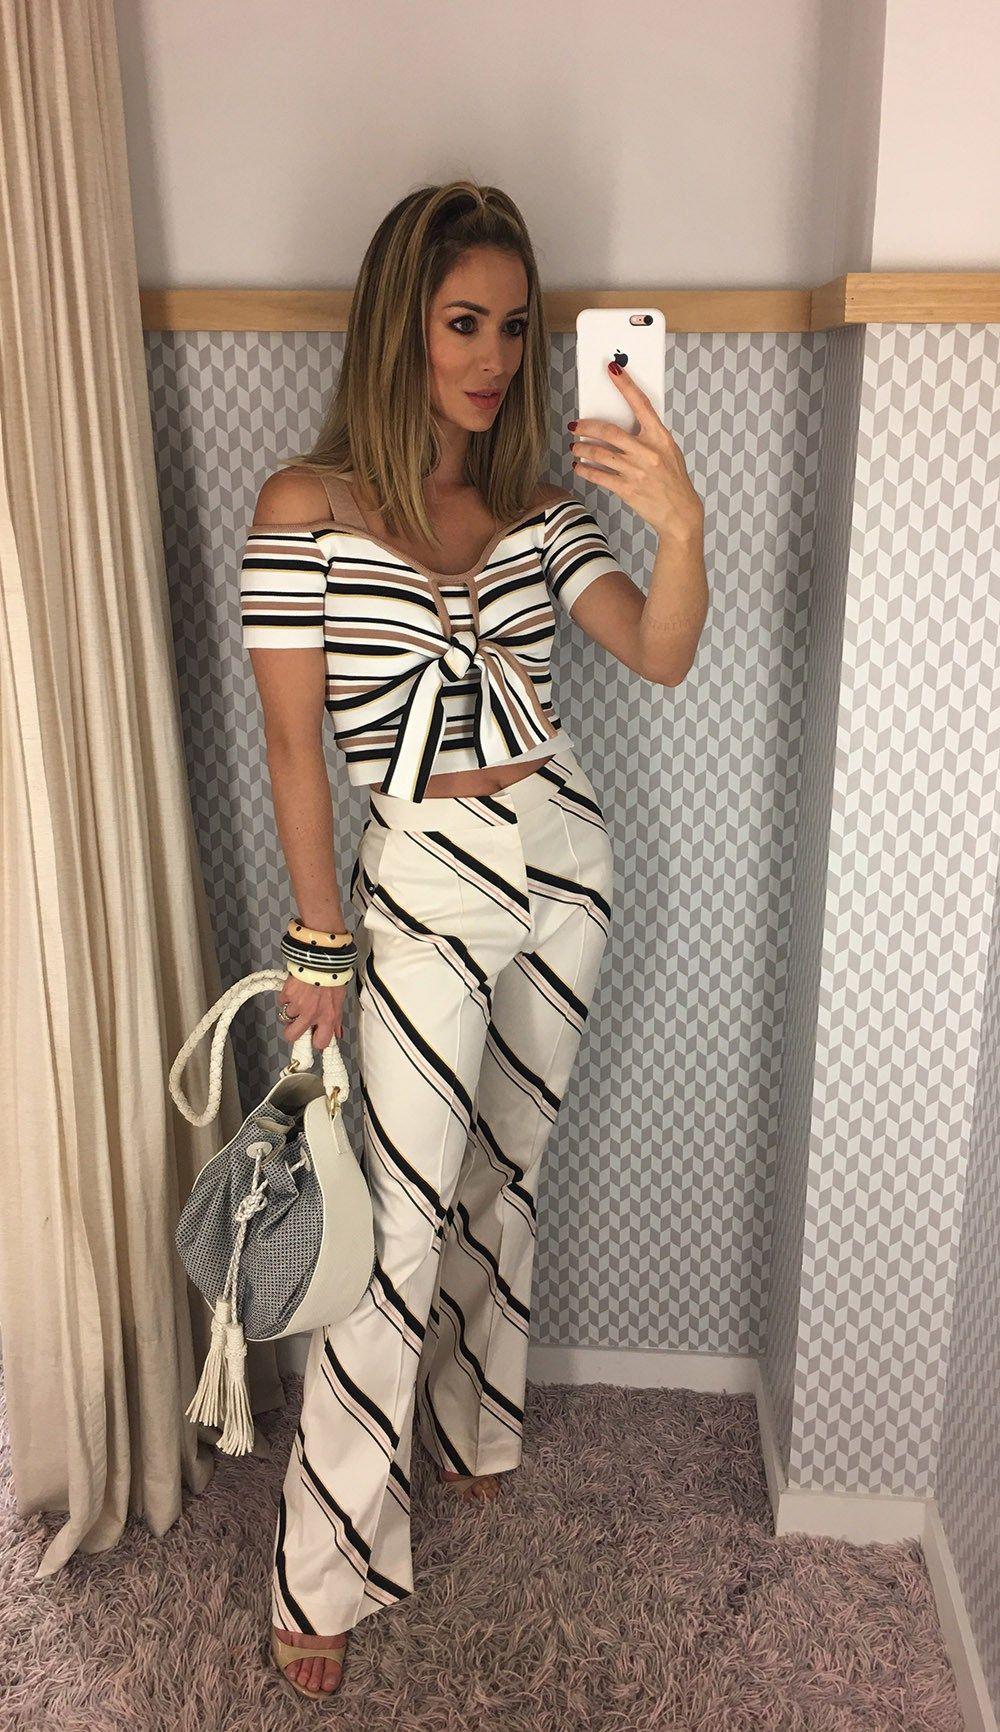 cc7b239c3 Batalha das fashionistas - Village Mall | calças mix | Blusas ...